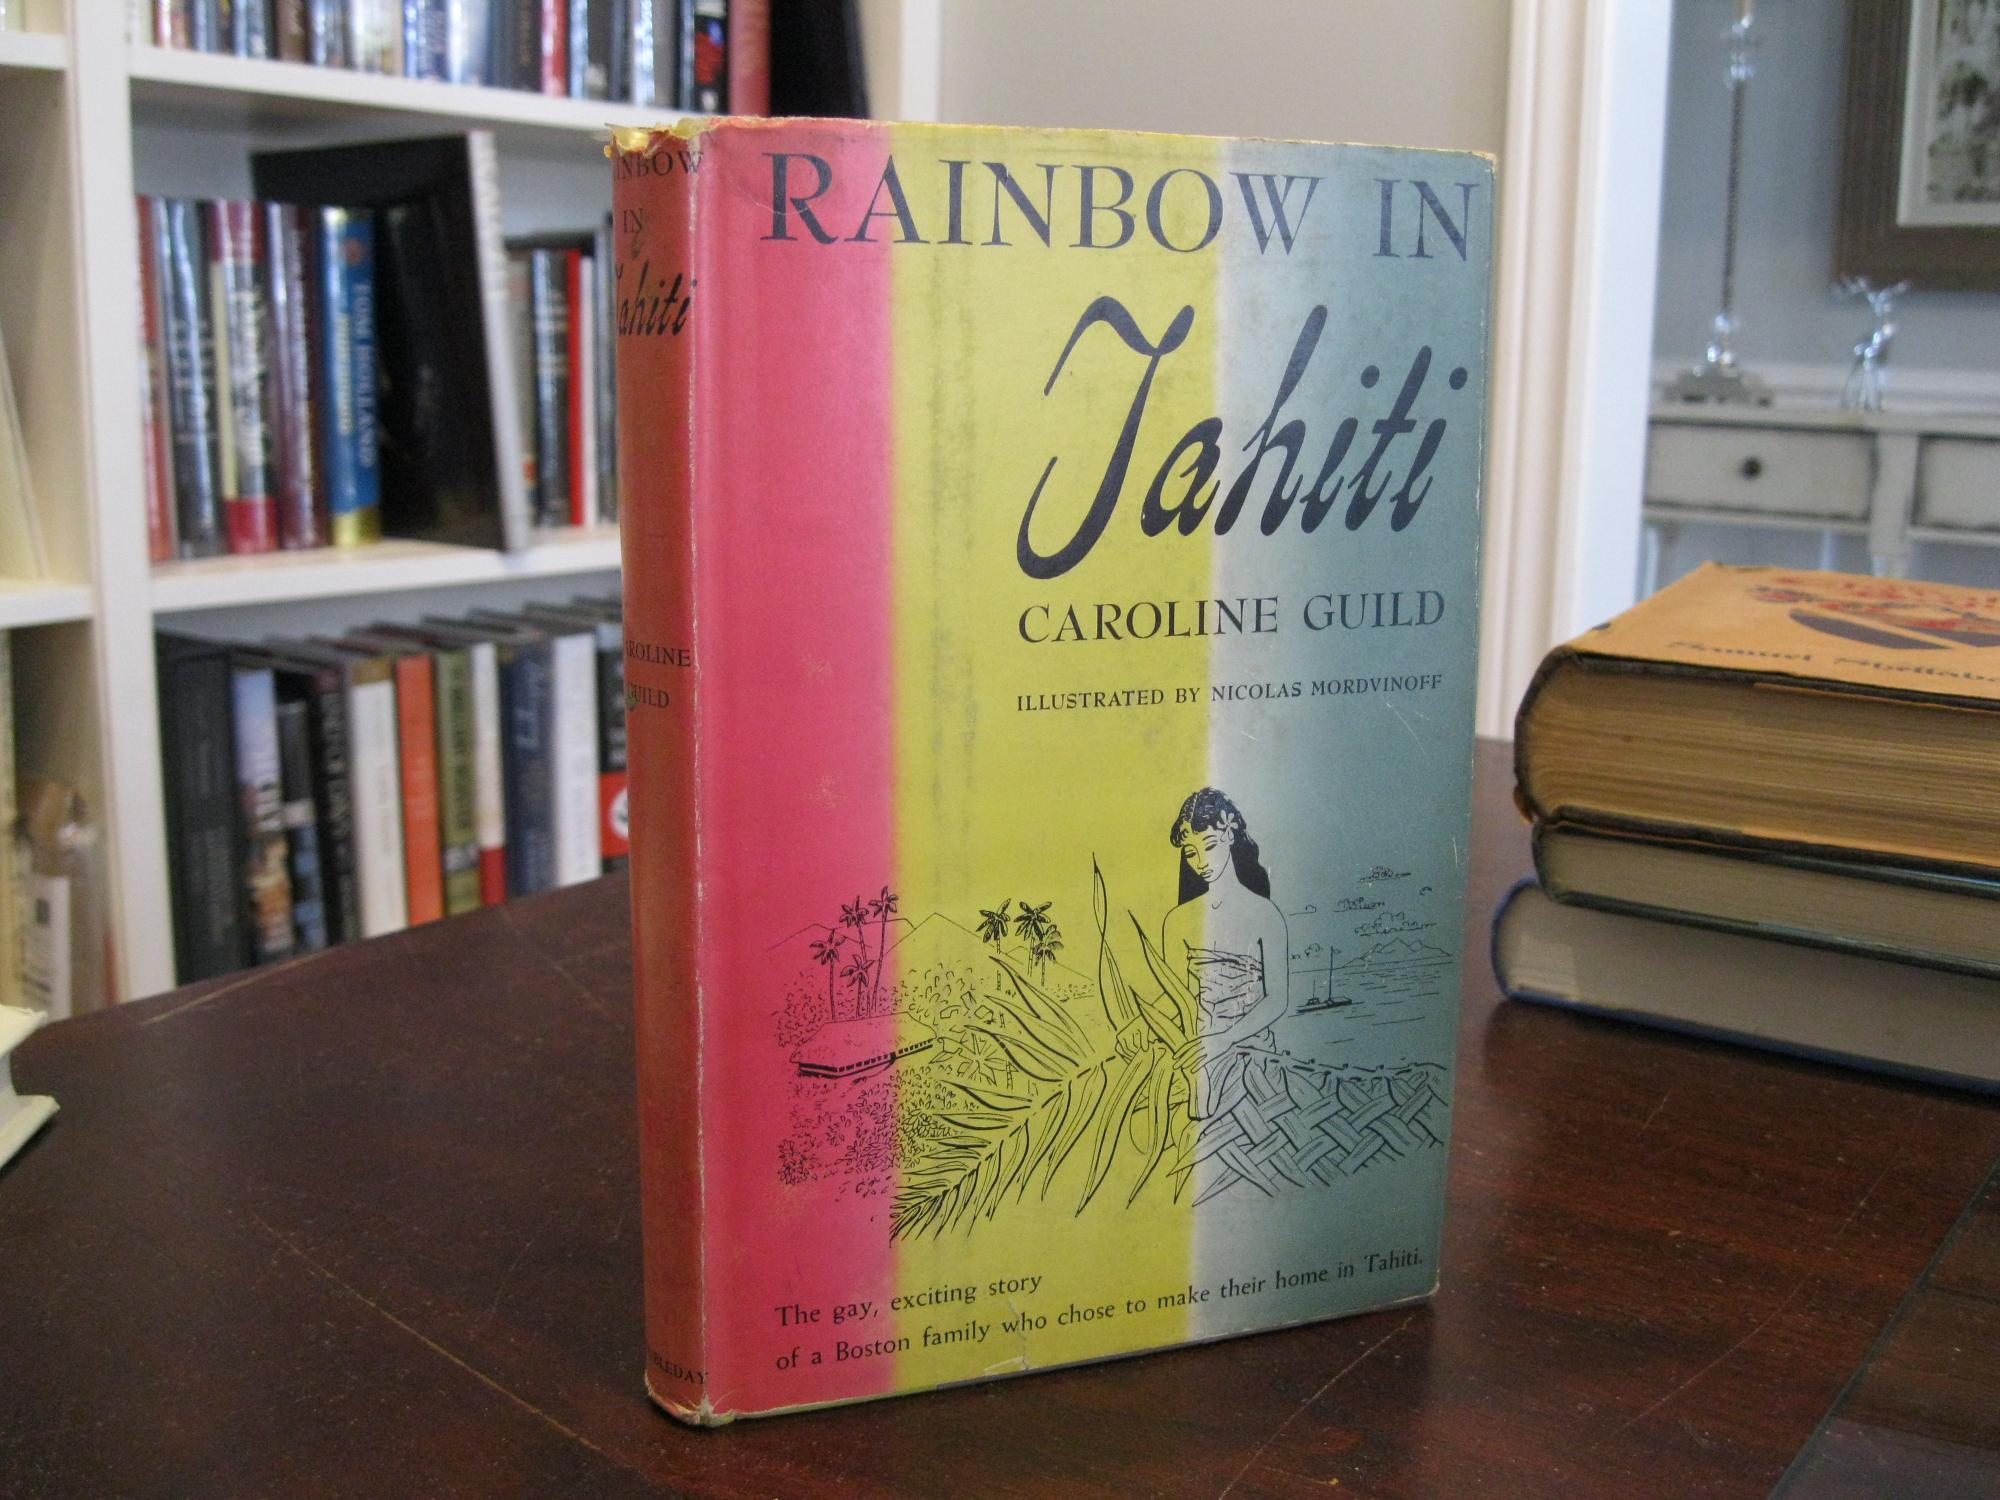 RAINBOW_IN_TAHITI_GUILD_CAROLINE_Very_Good_Hardcover